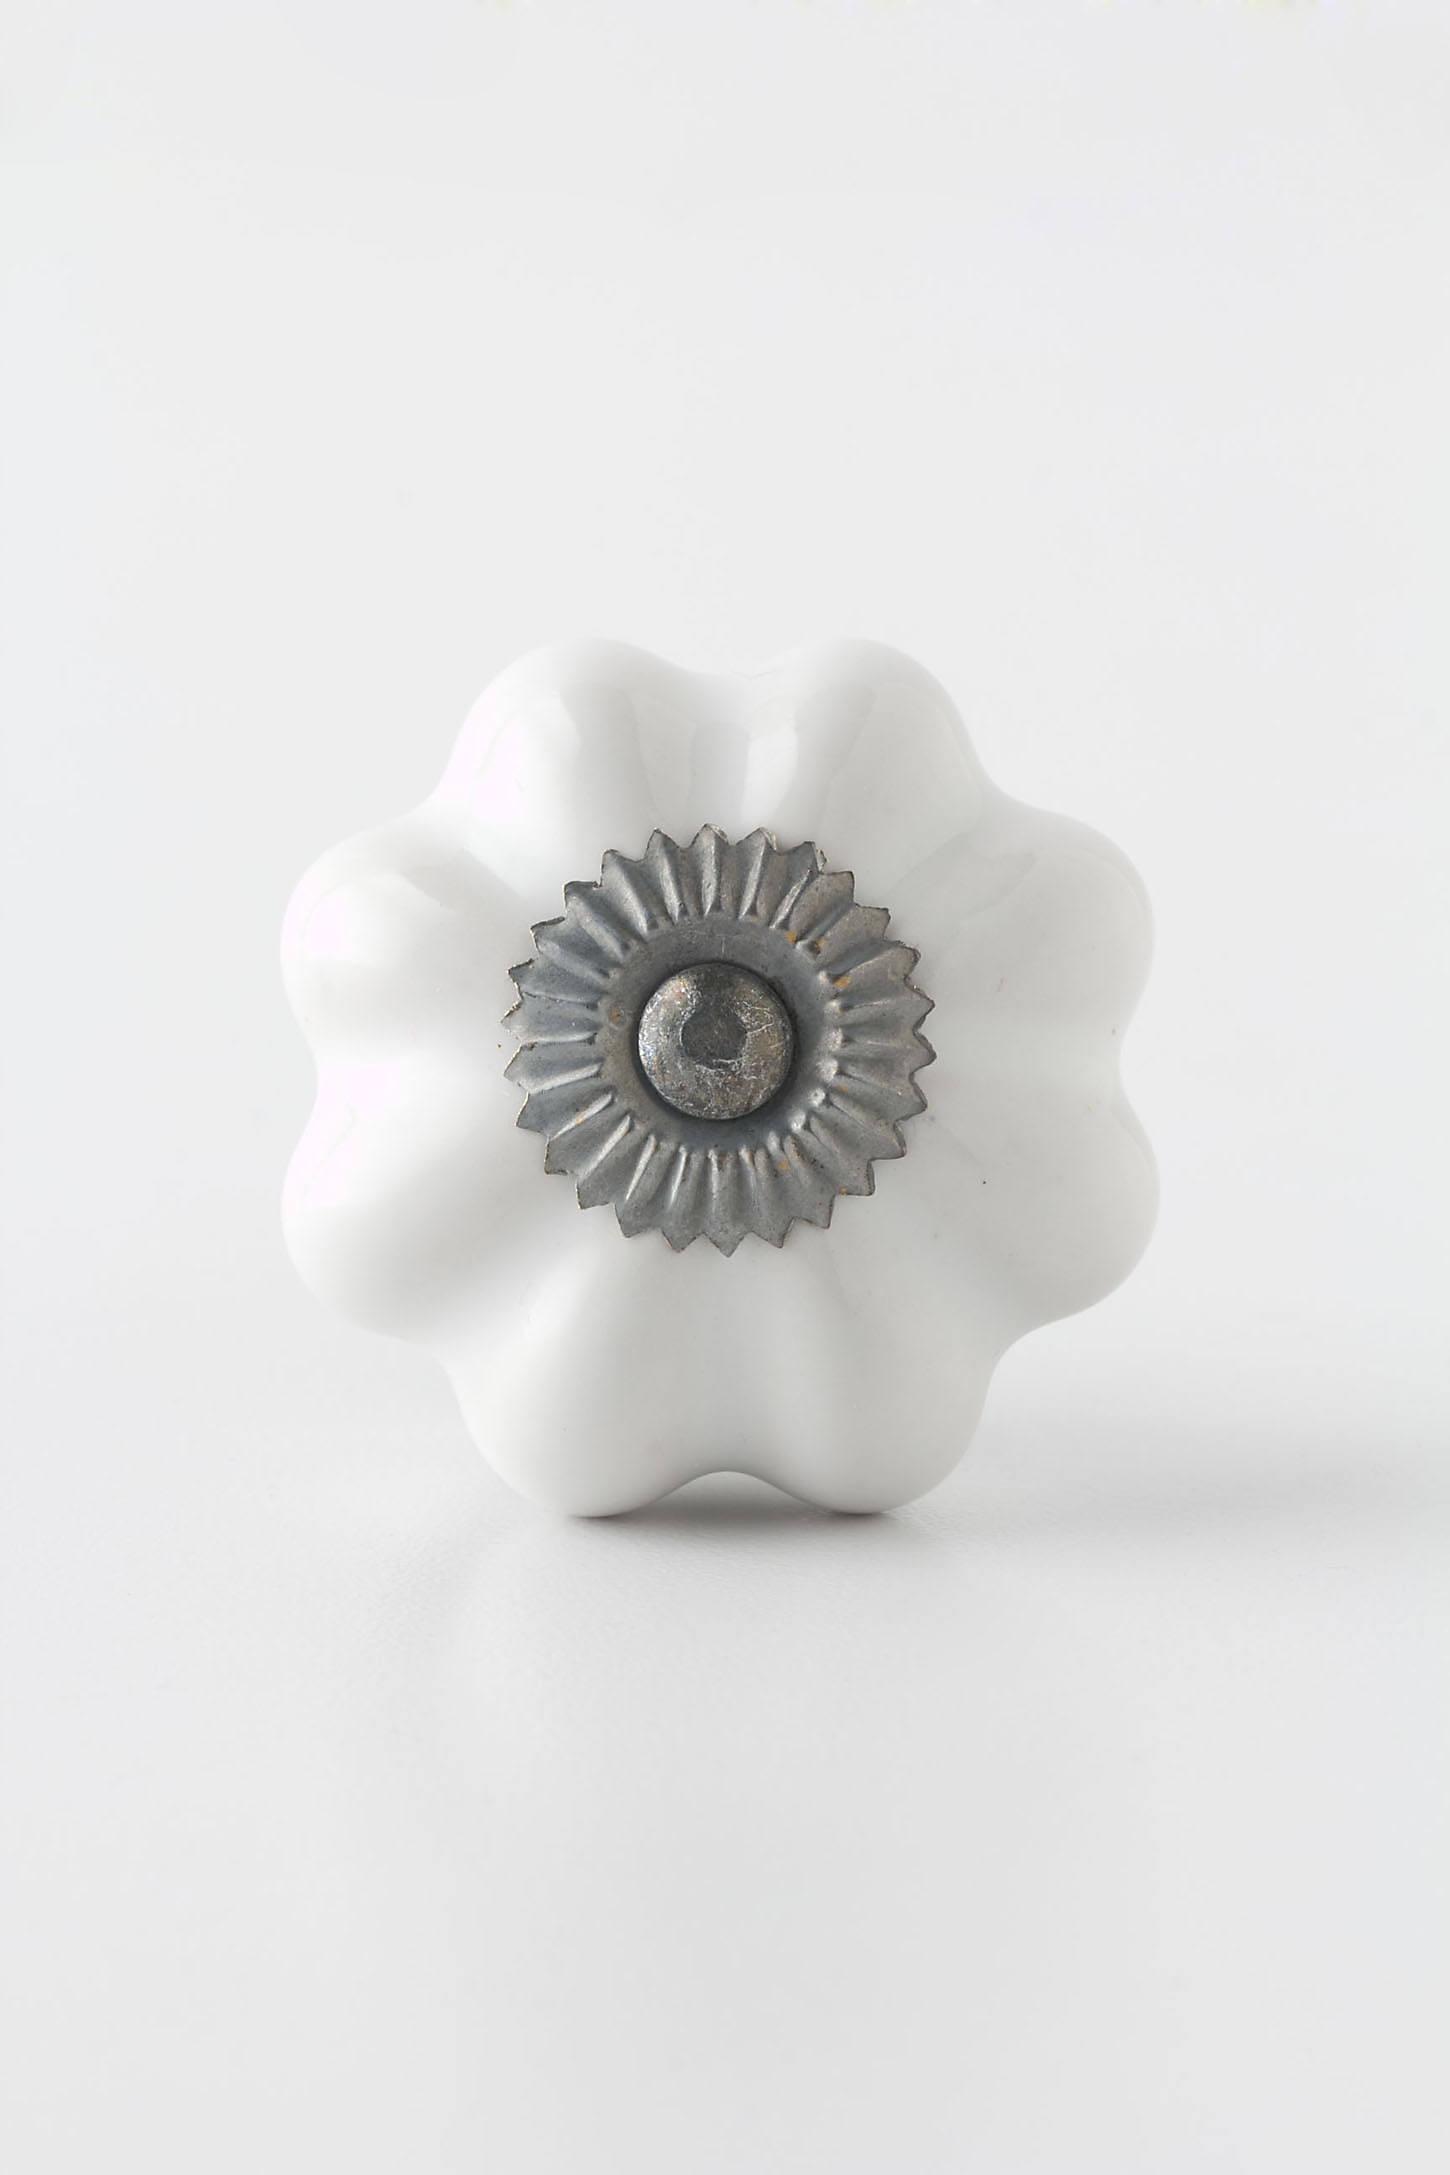 Ceramic Melon Knob, Zinc